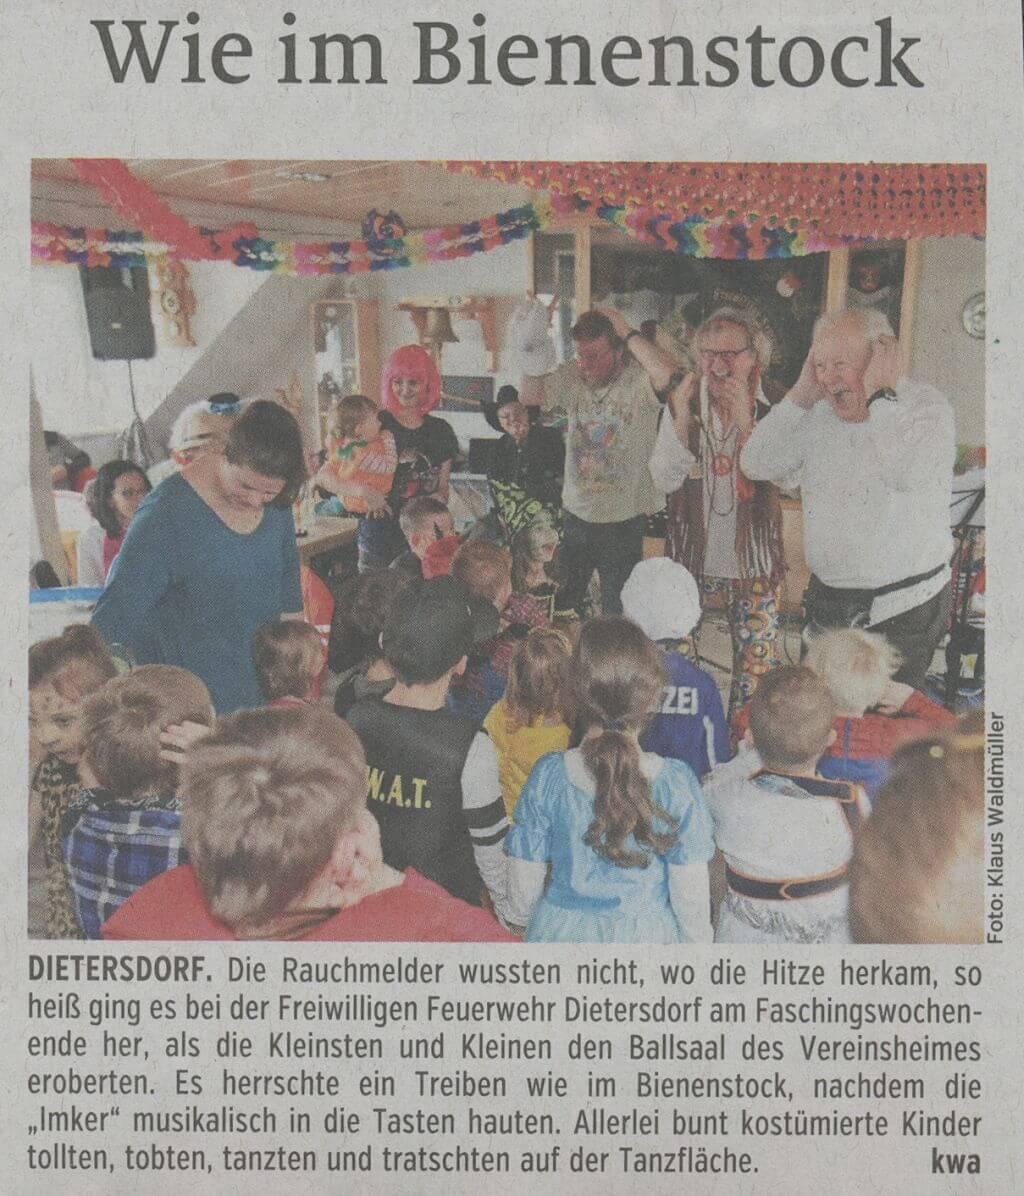 26.02.2020 - Wie im Bienenstock - Schwabacher Tagblatt